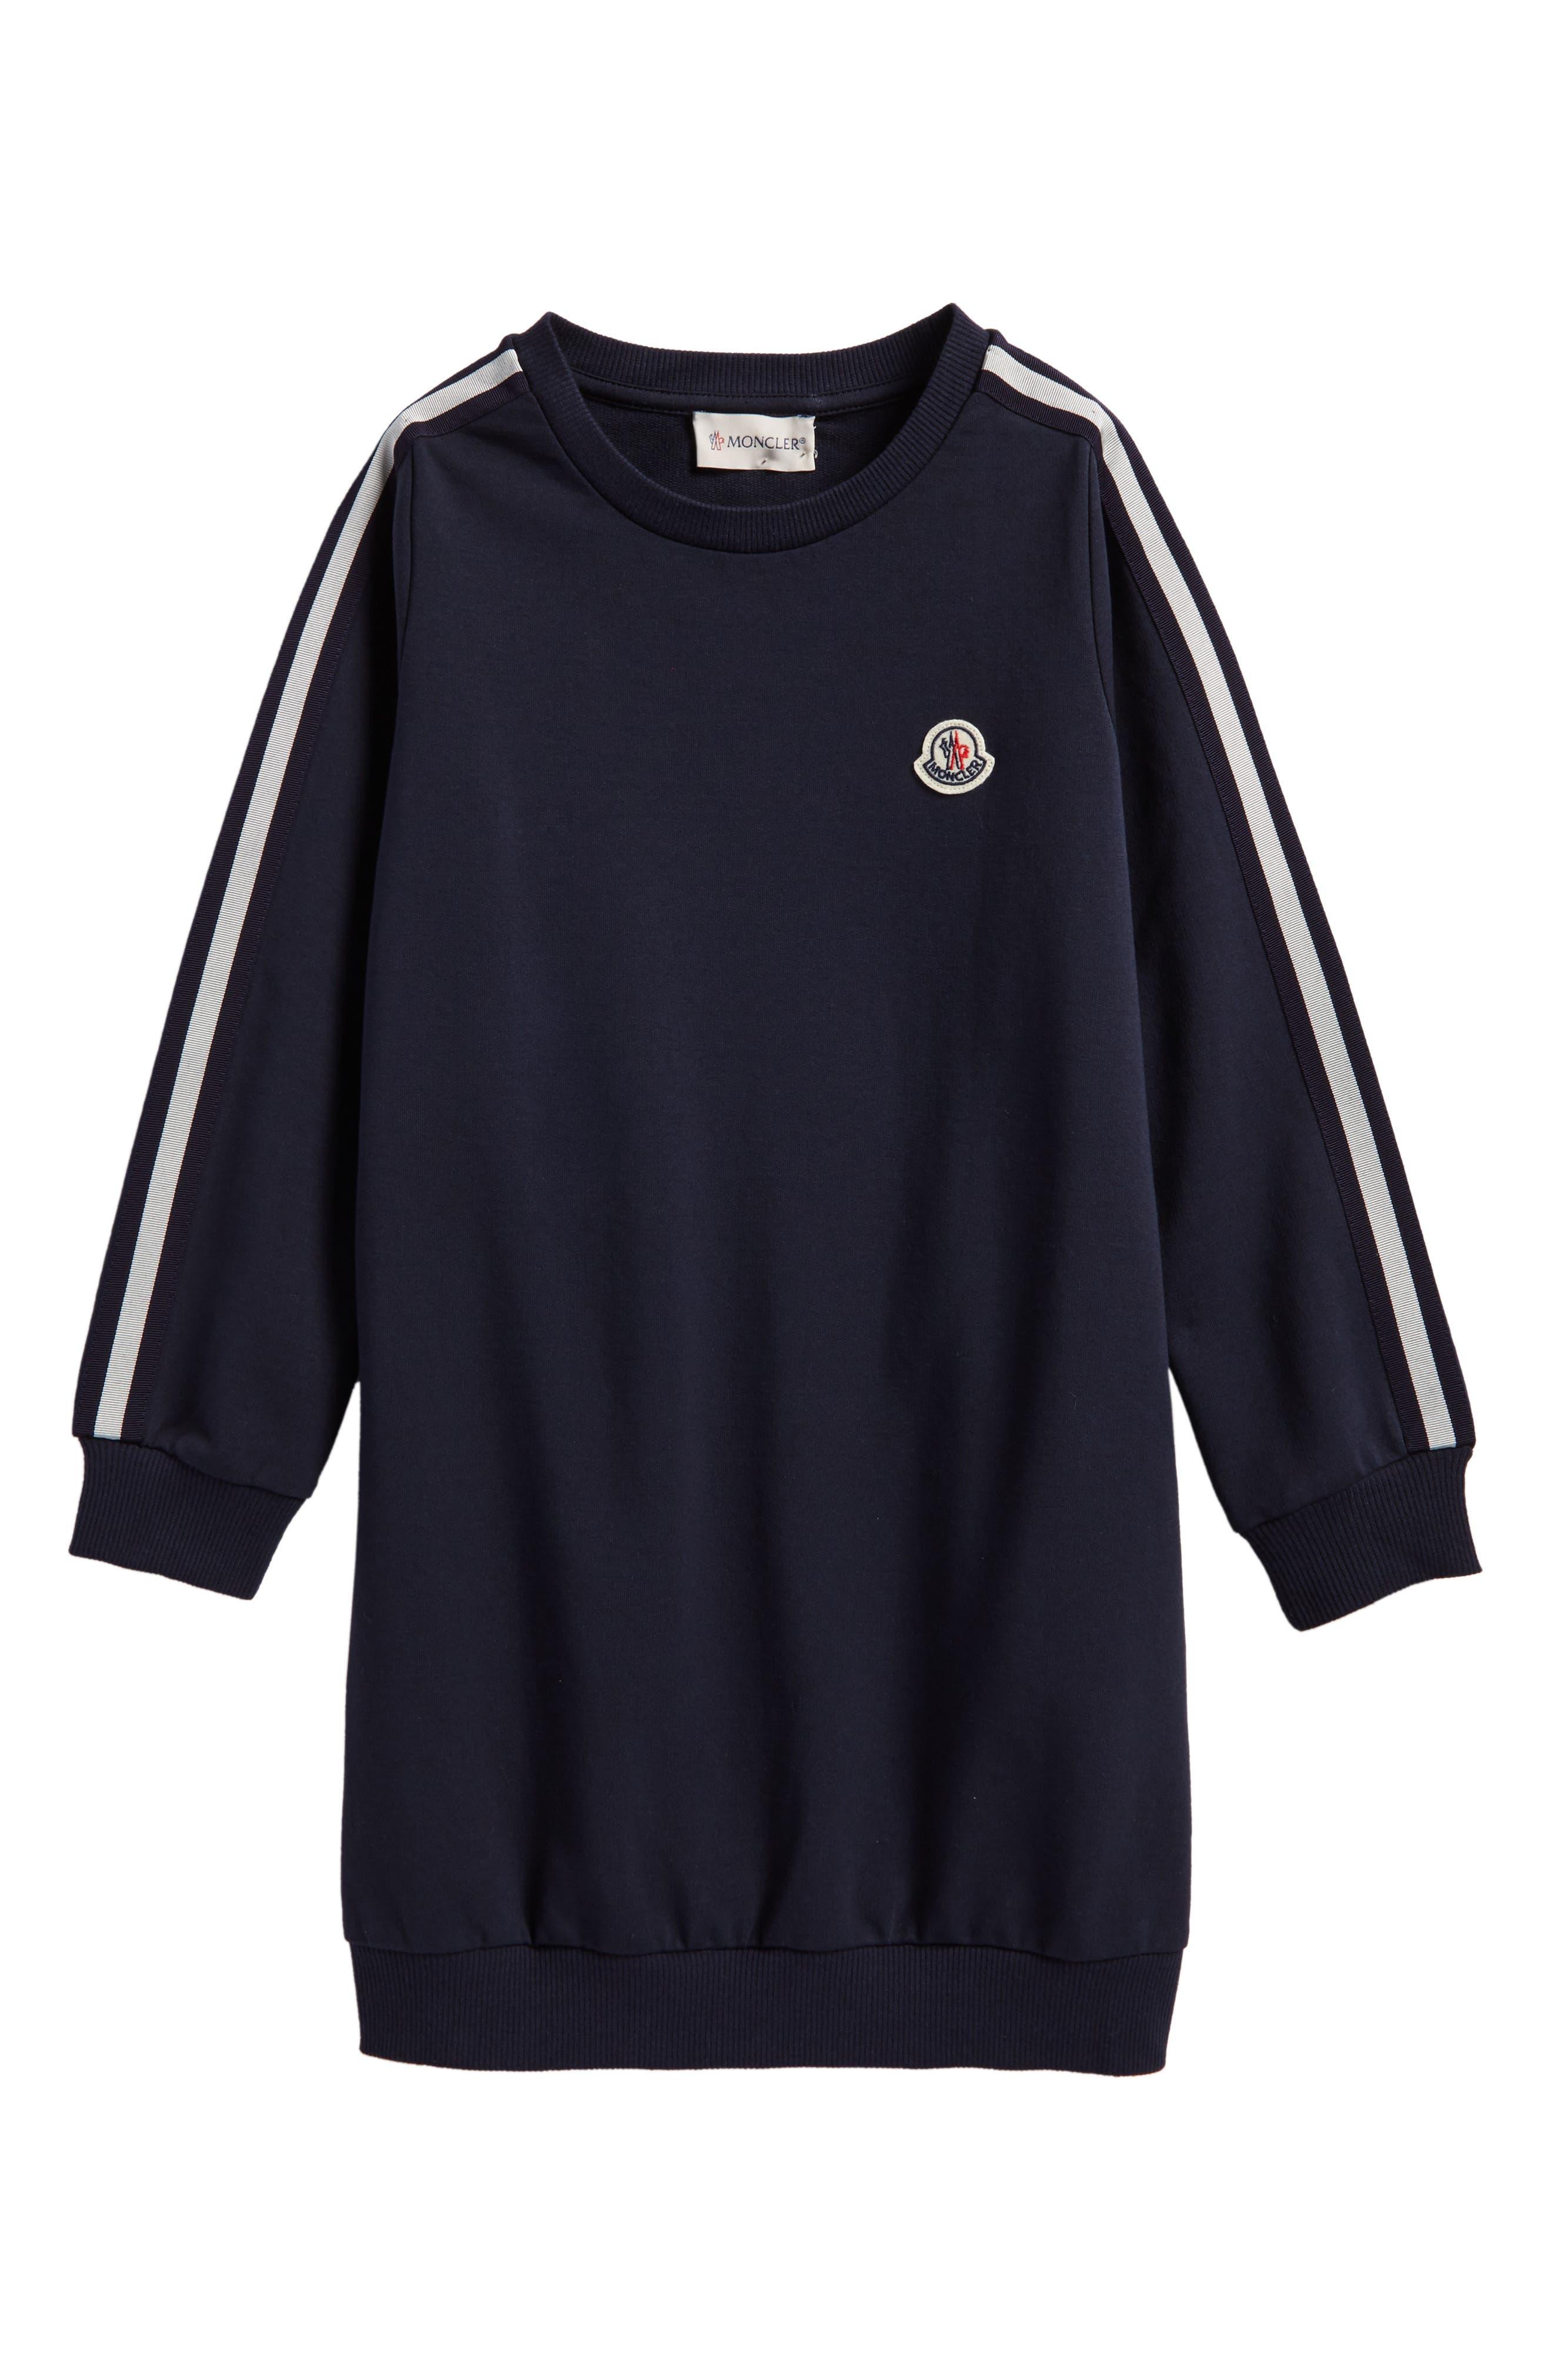 Main Image - Moncler Sweatshirt Dress (Little Girls & Big Girls)